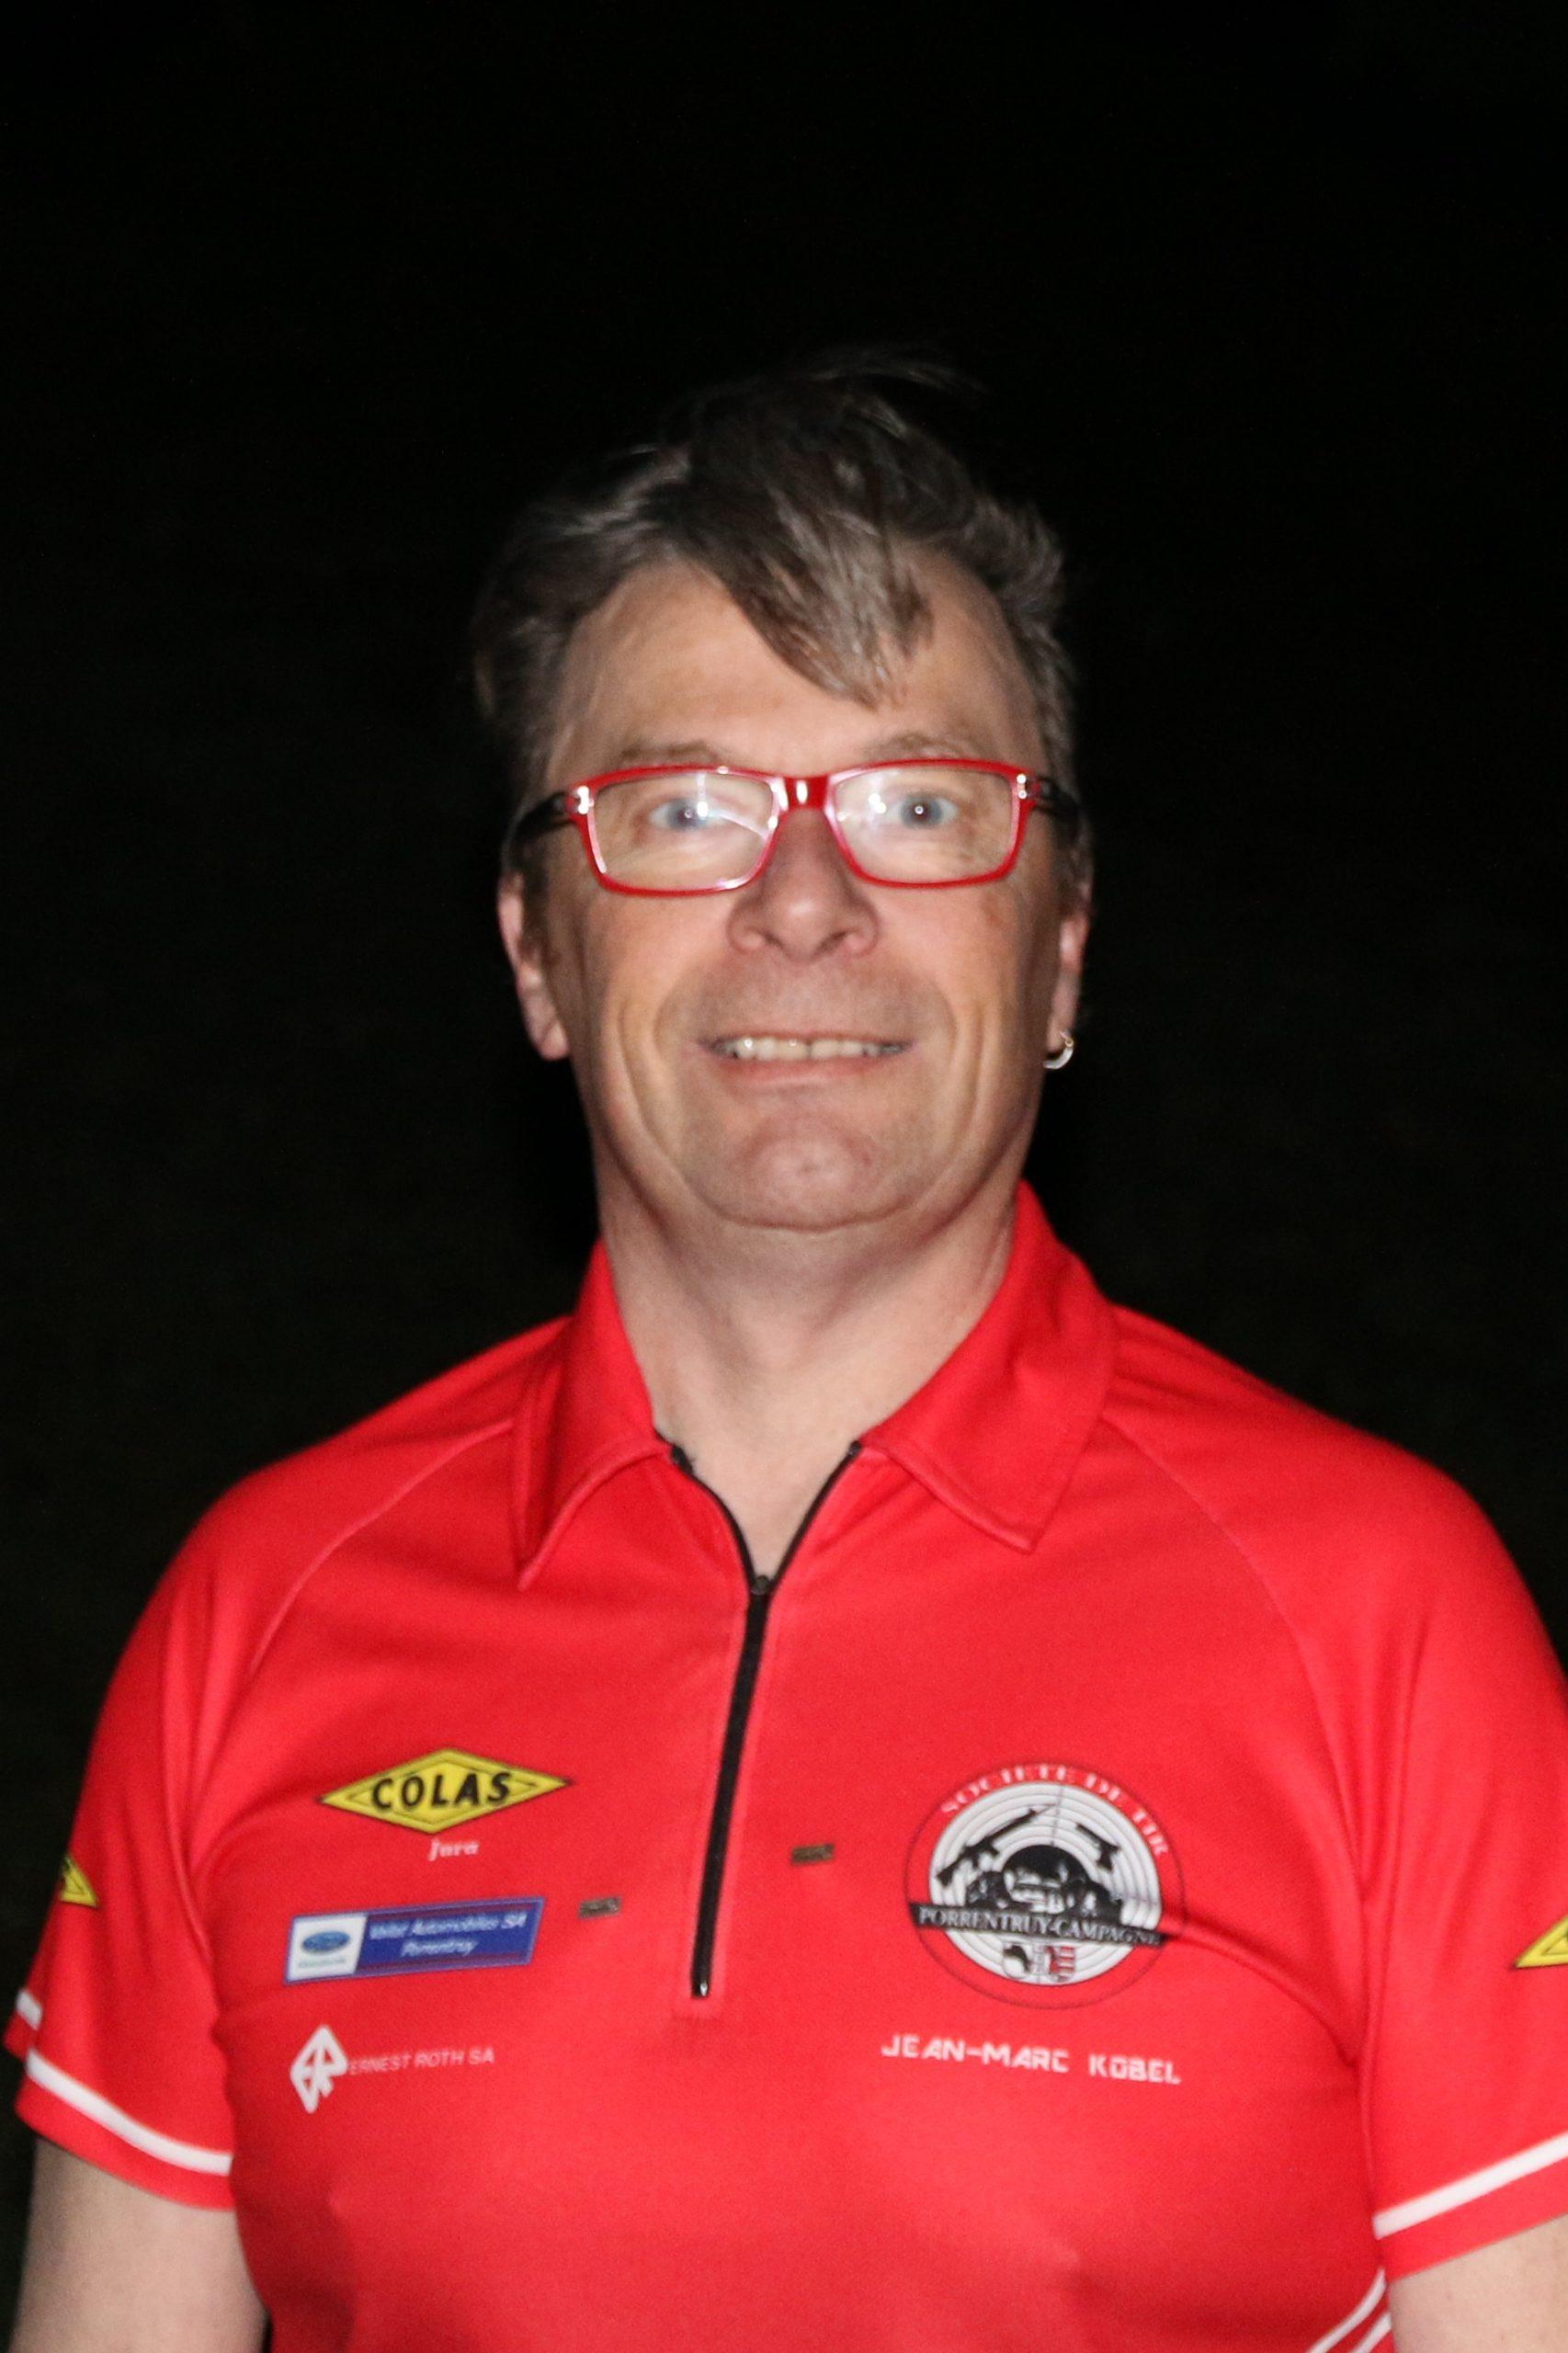 Kobel Jean-Marc